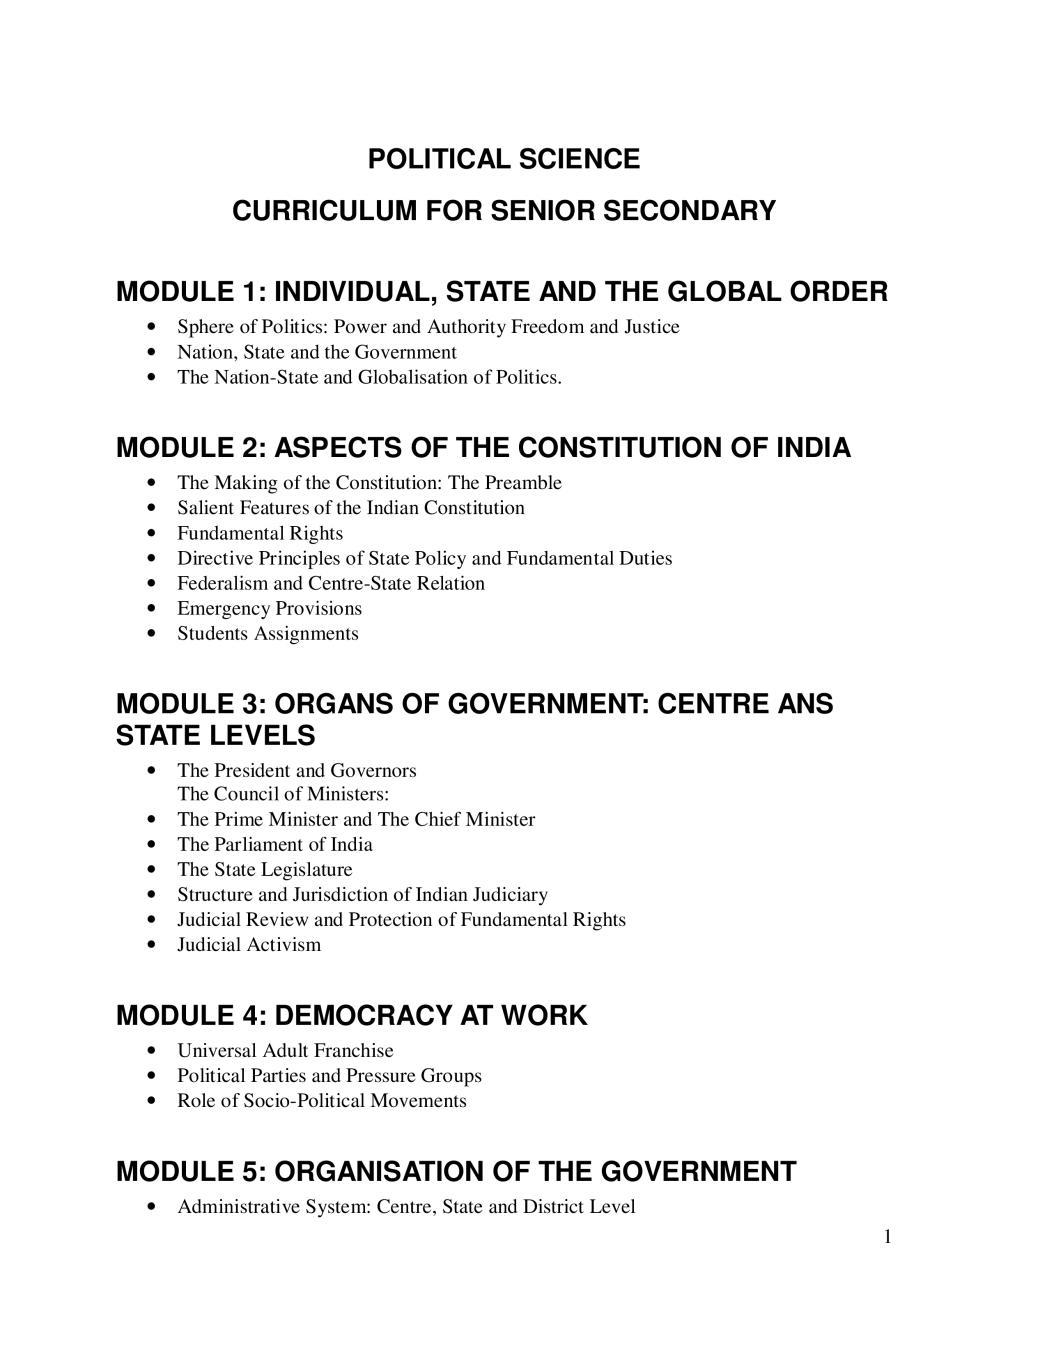 NIOS Class 12 Syllabus - Political Science - Page 1